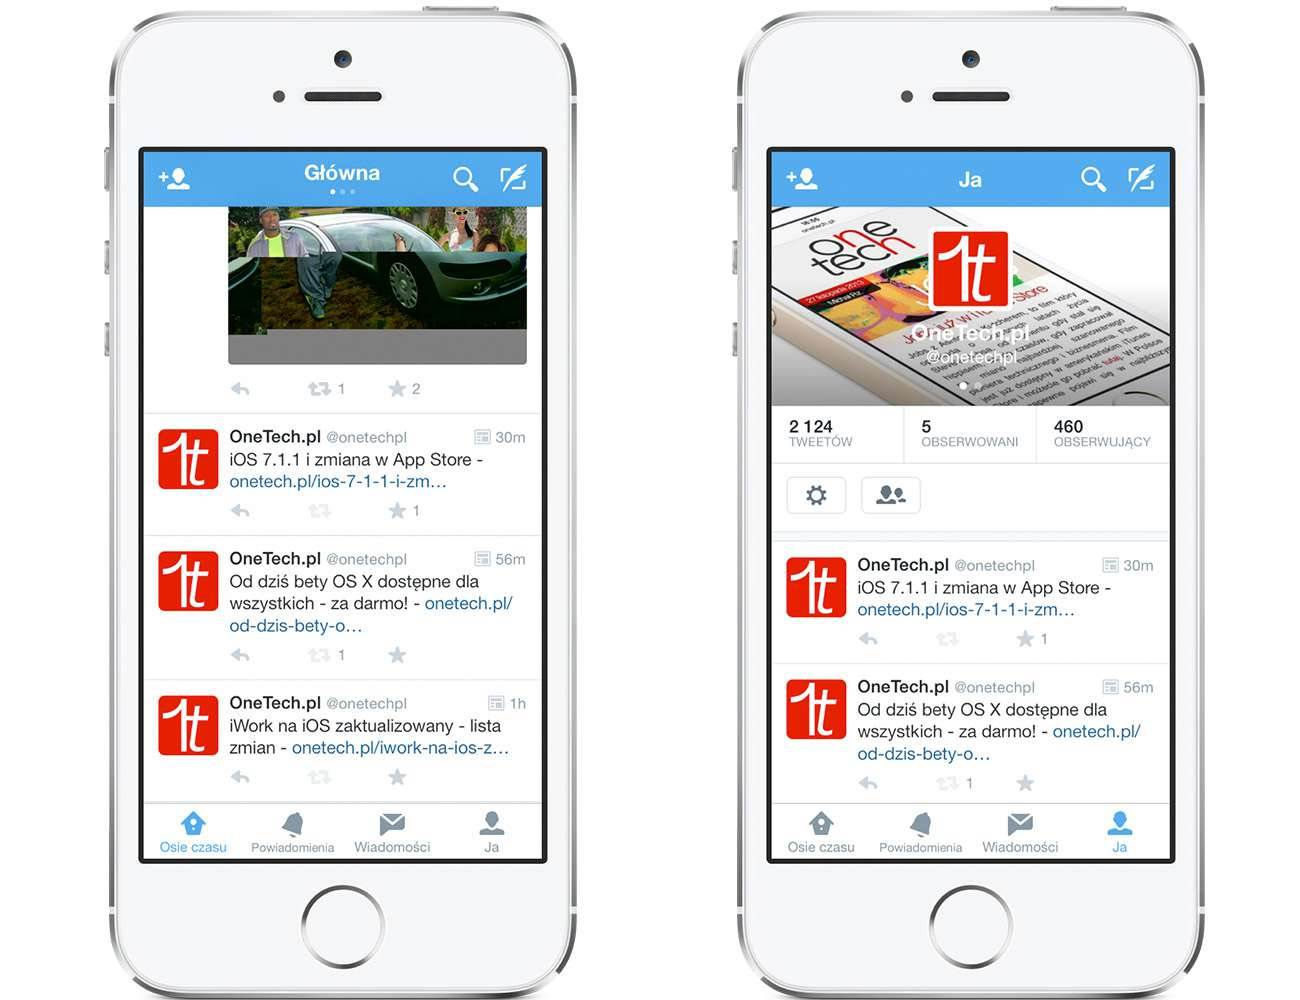 Twitter.FullScreen.onetech.pl